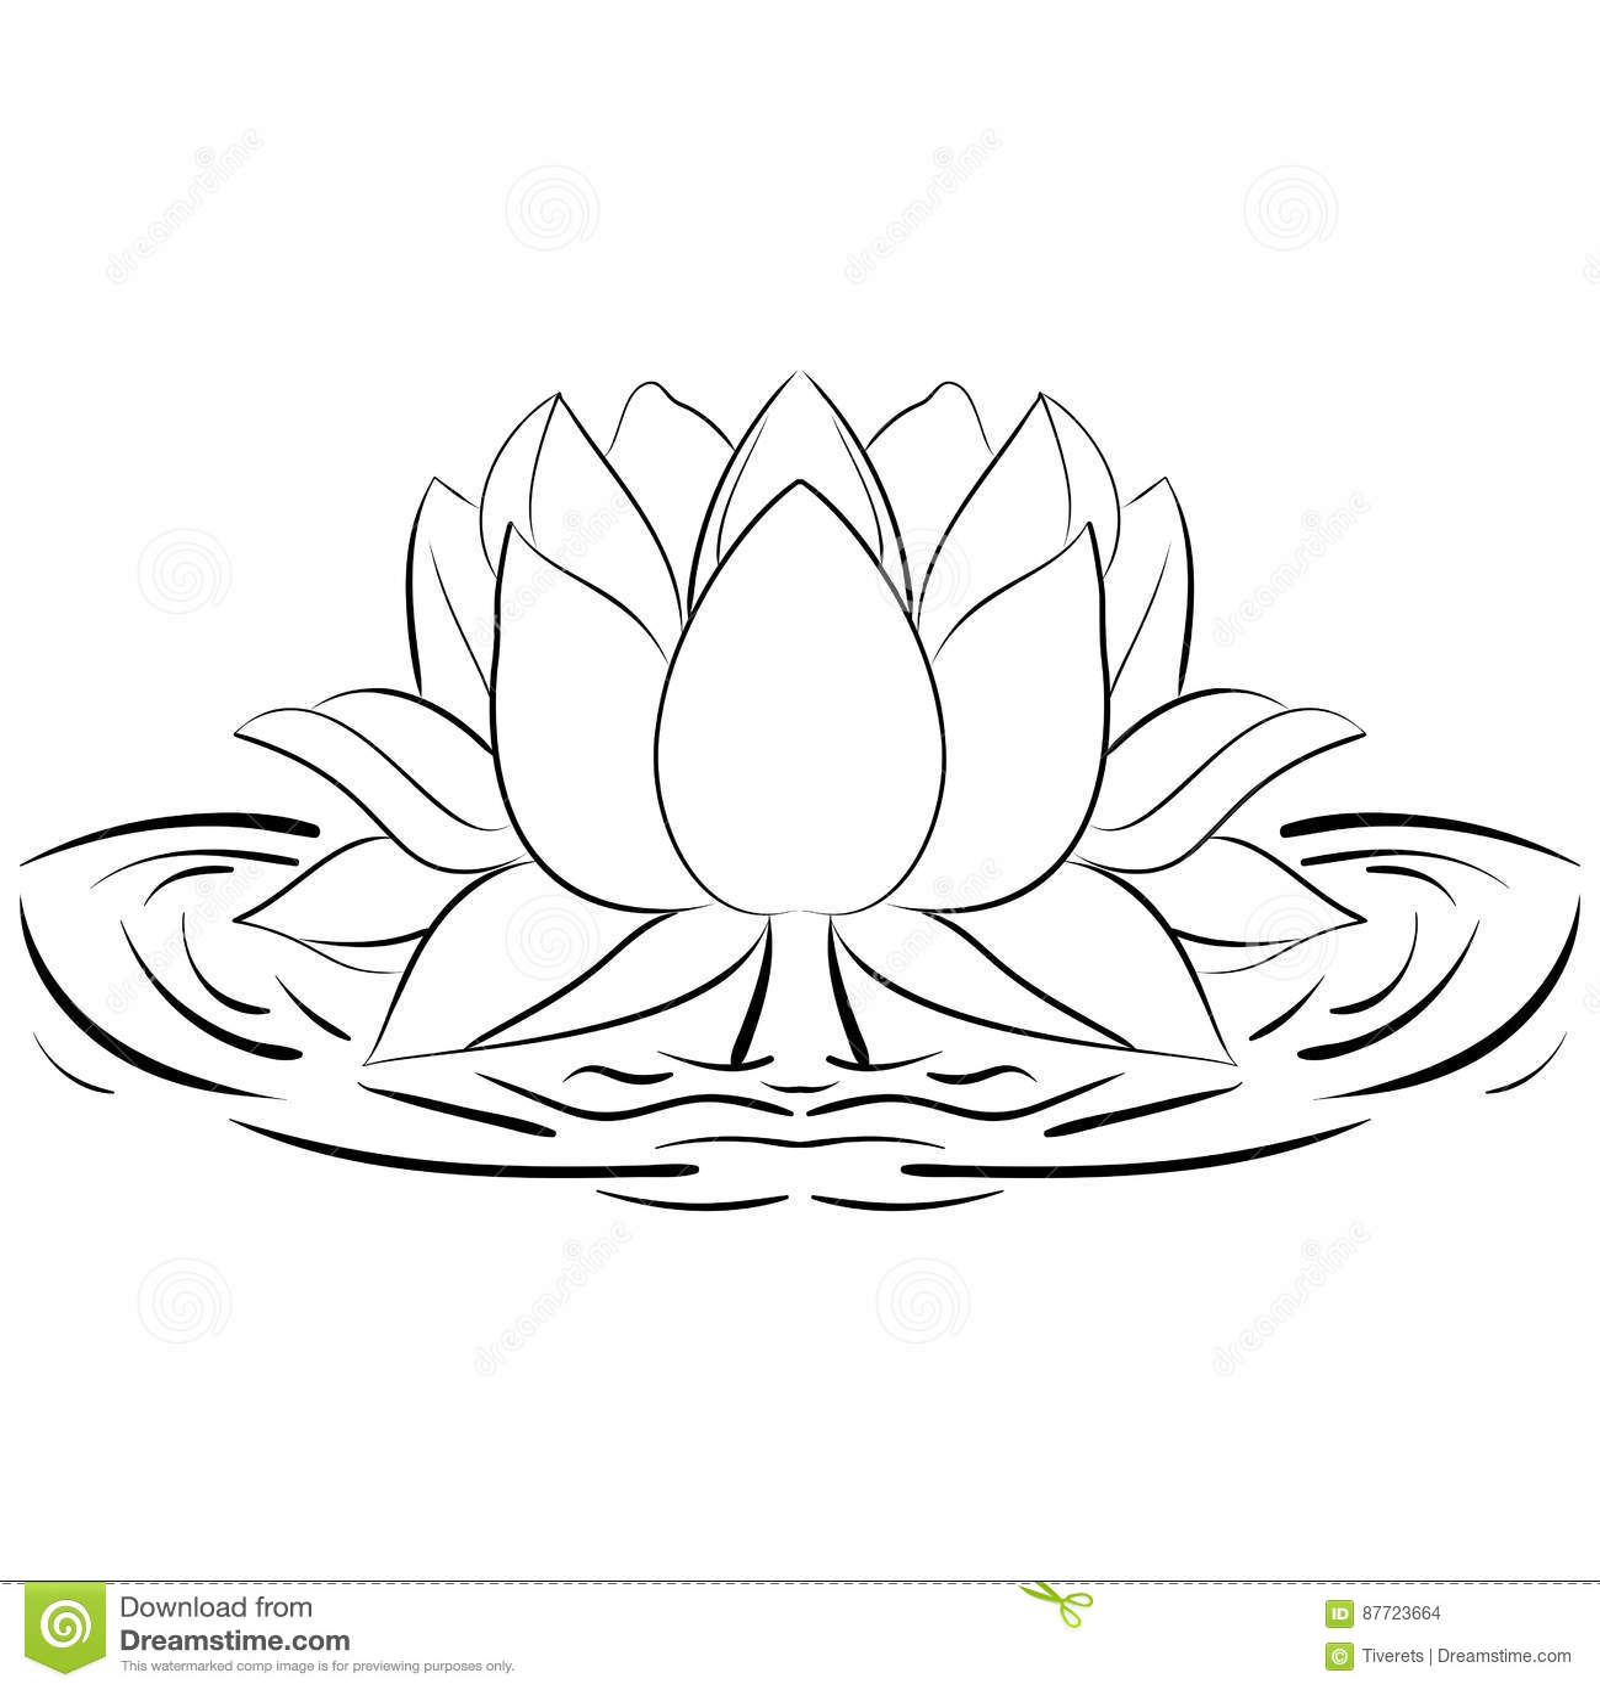 Lotus sketch flower design elements illustration stock vector download lotus sketch flower design elements illustration stock vector illustration of close drawing mightylinksfo